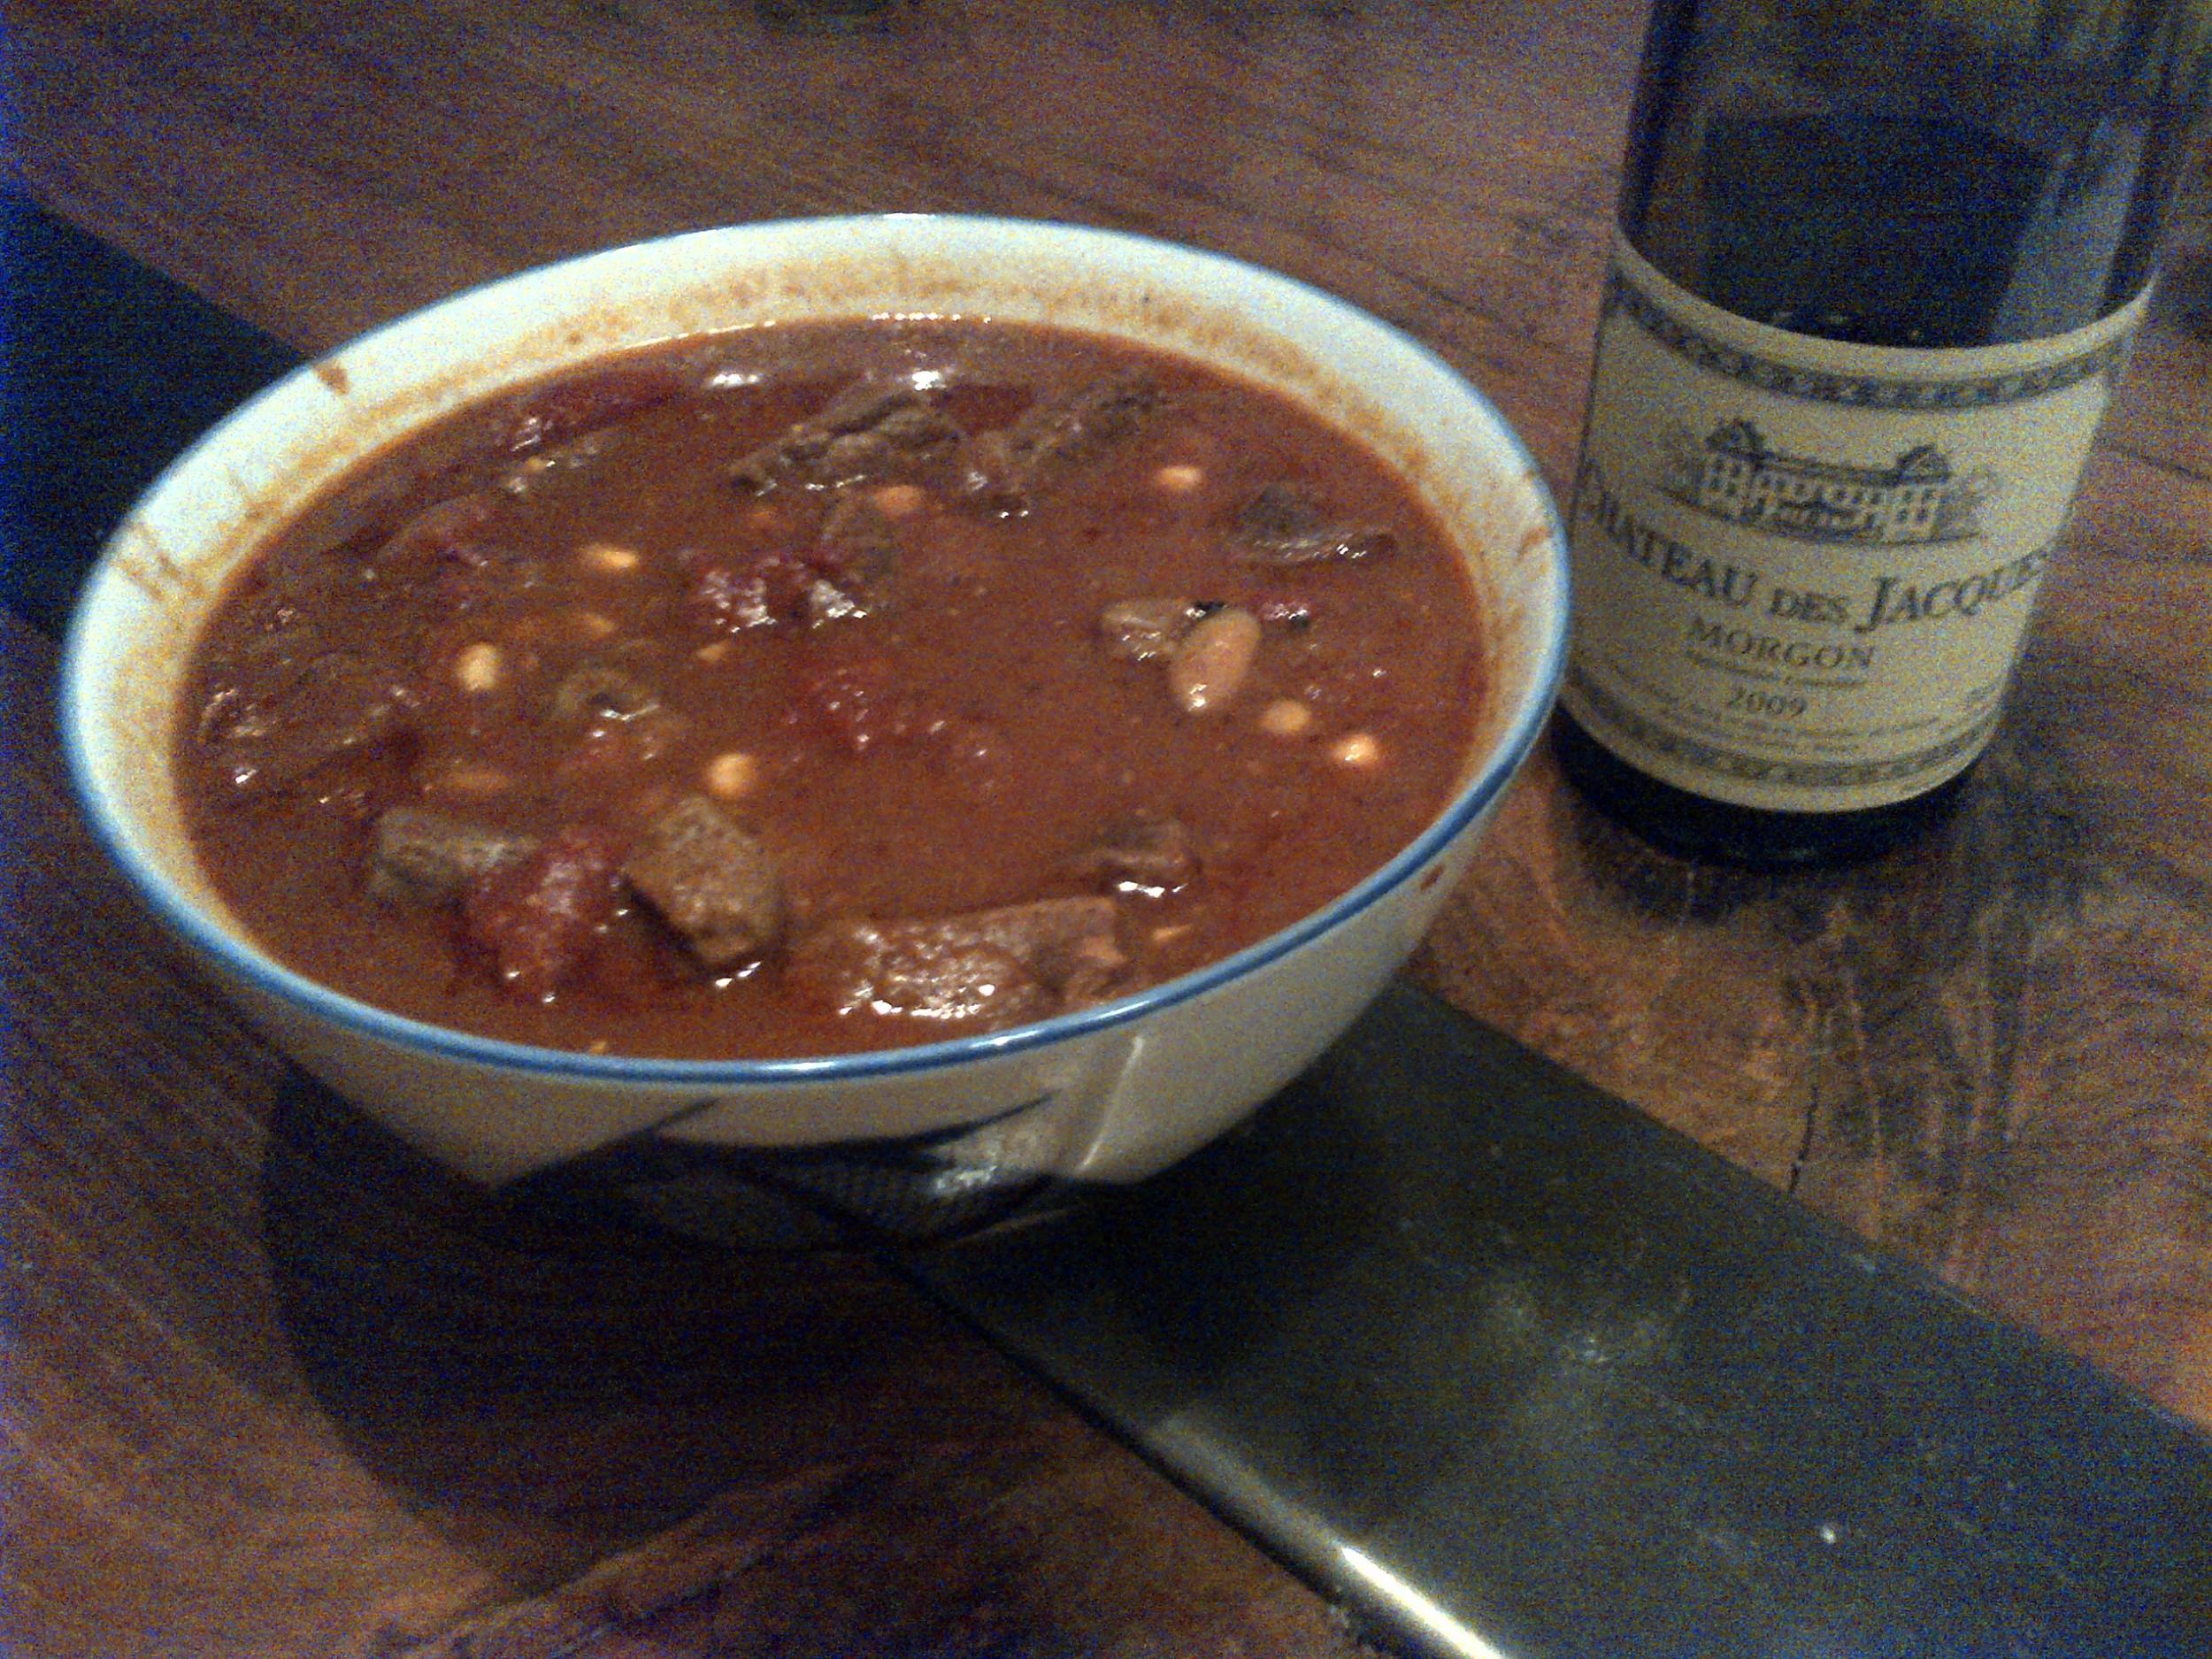 Southern Soul Brunswick Stew from Garden & Gun Magazine perfect with a great Morgon. http://gardenandgun.com/article/brunswick-stew-recipe